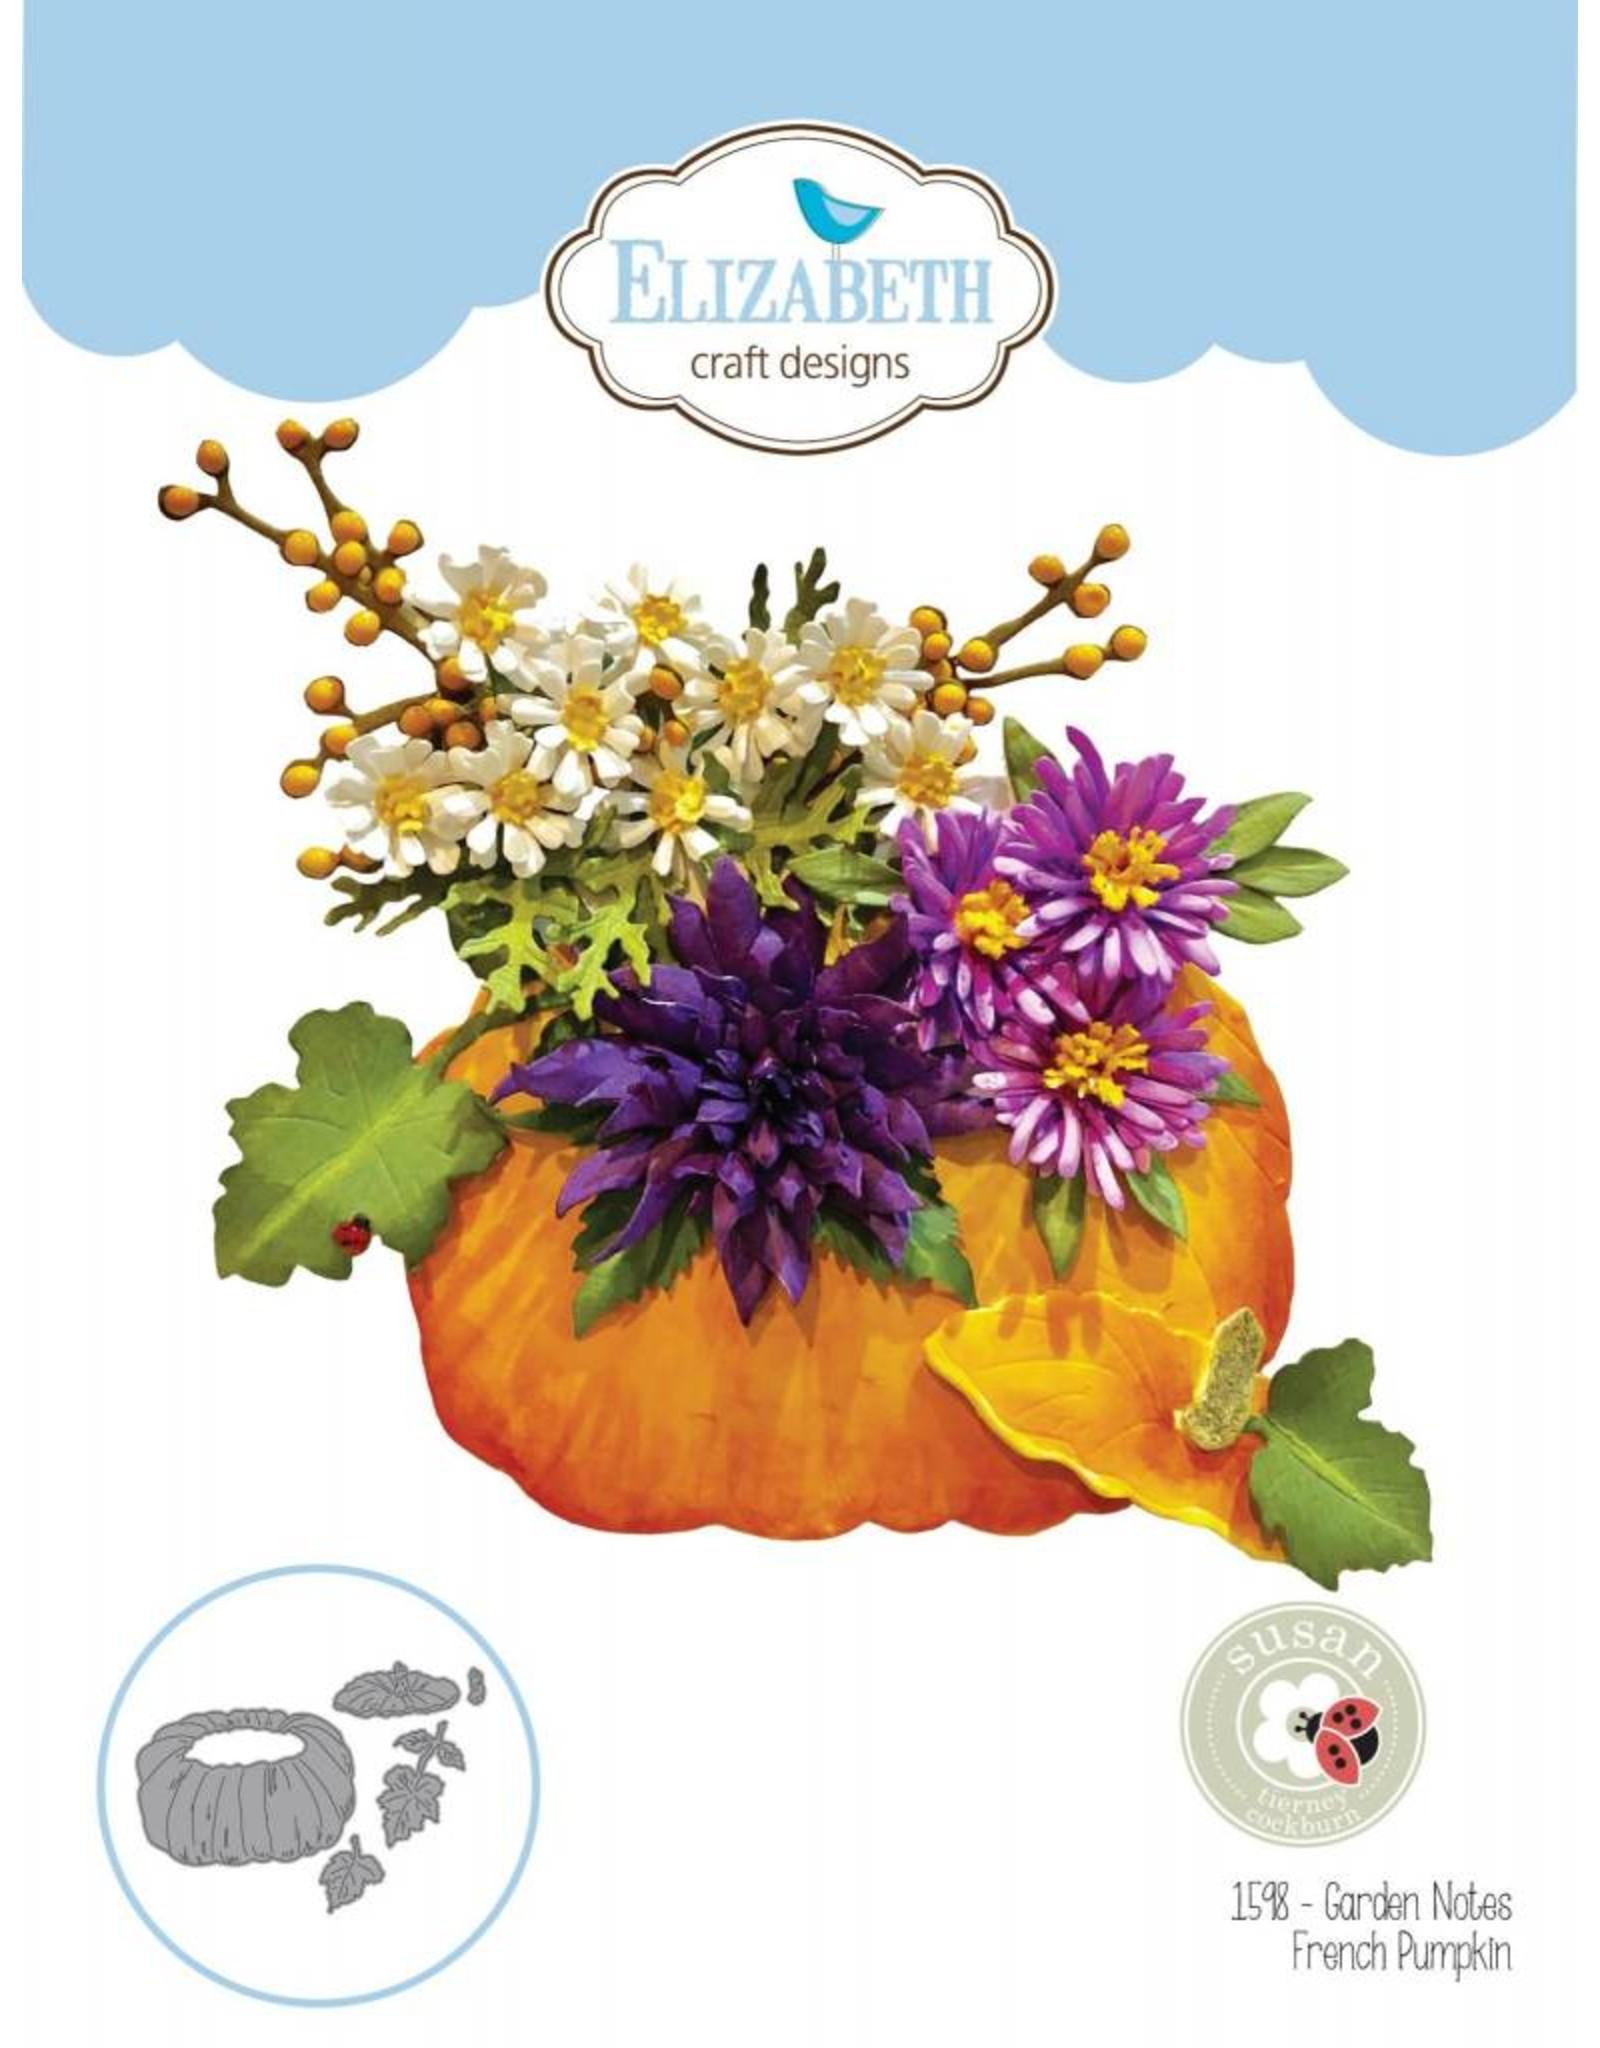 Elizabeth Craft Designs Elizabeth Craft Designs Garden Notes - French Pumpkin  1598